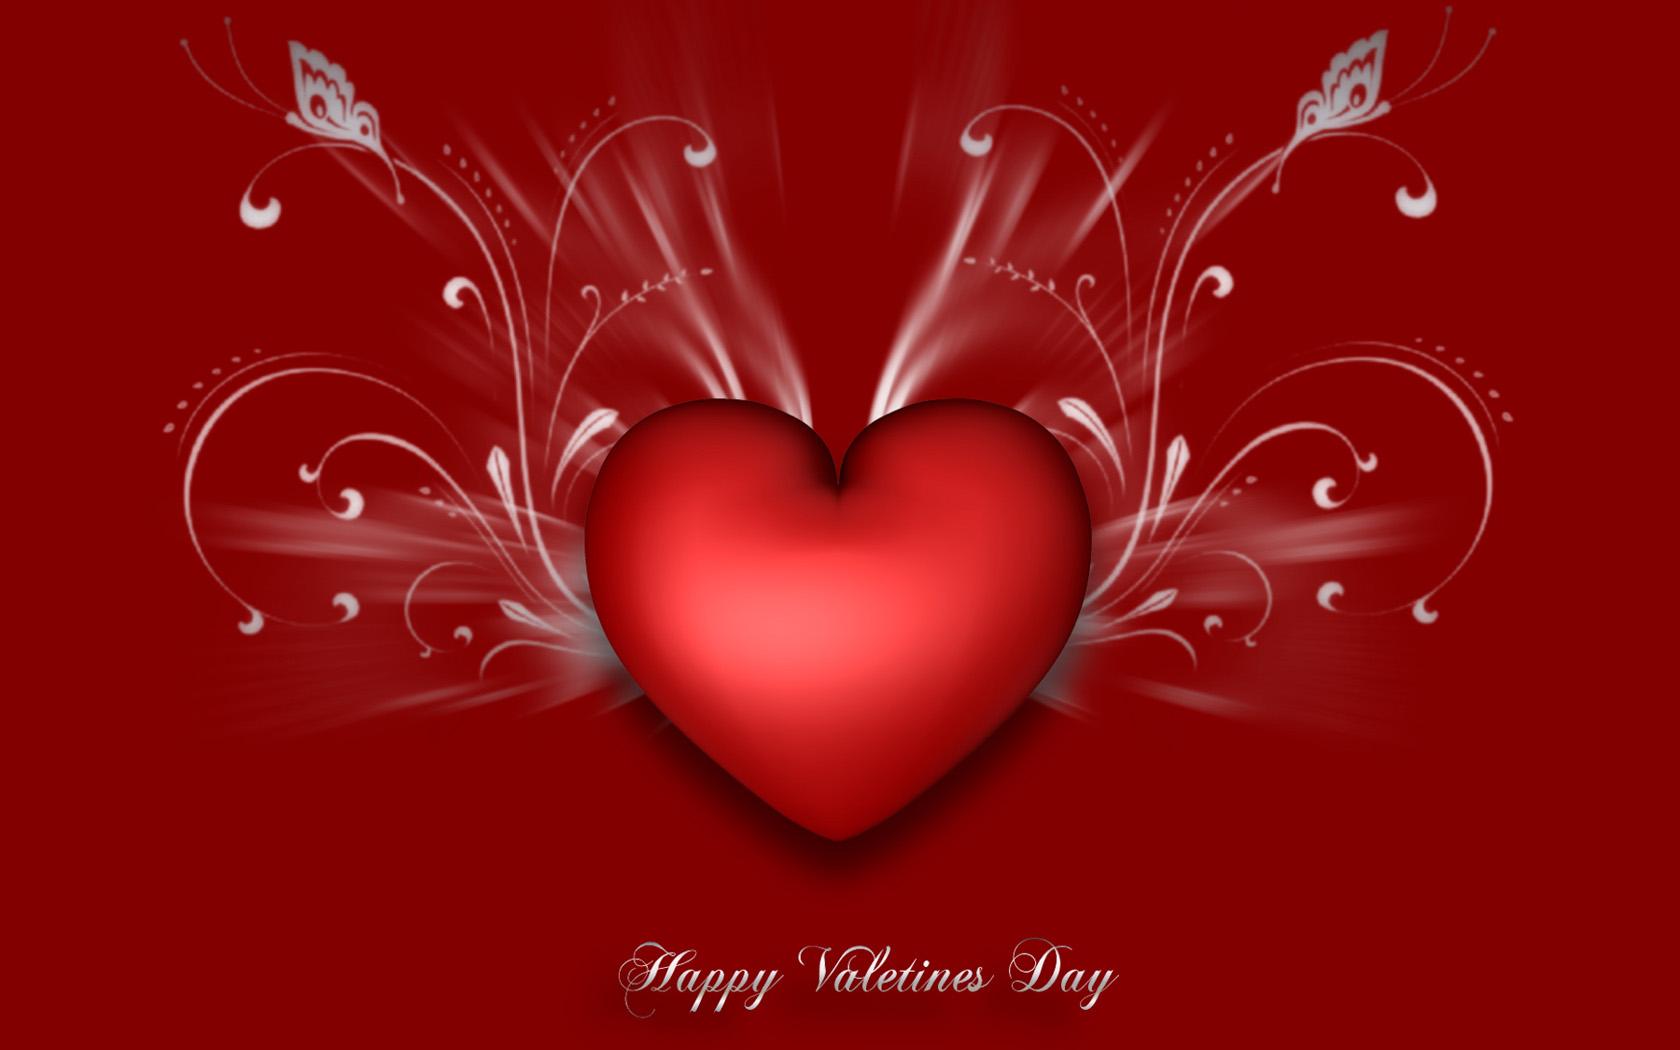 Screensaver Valentine Day Great World 1680x1050